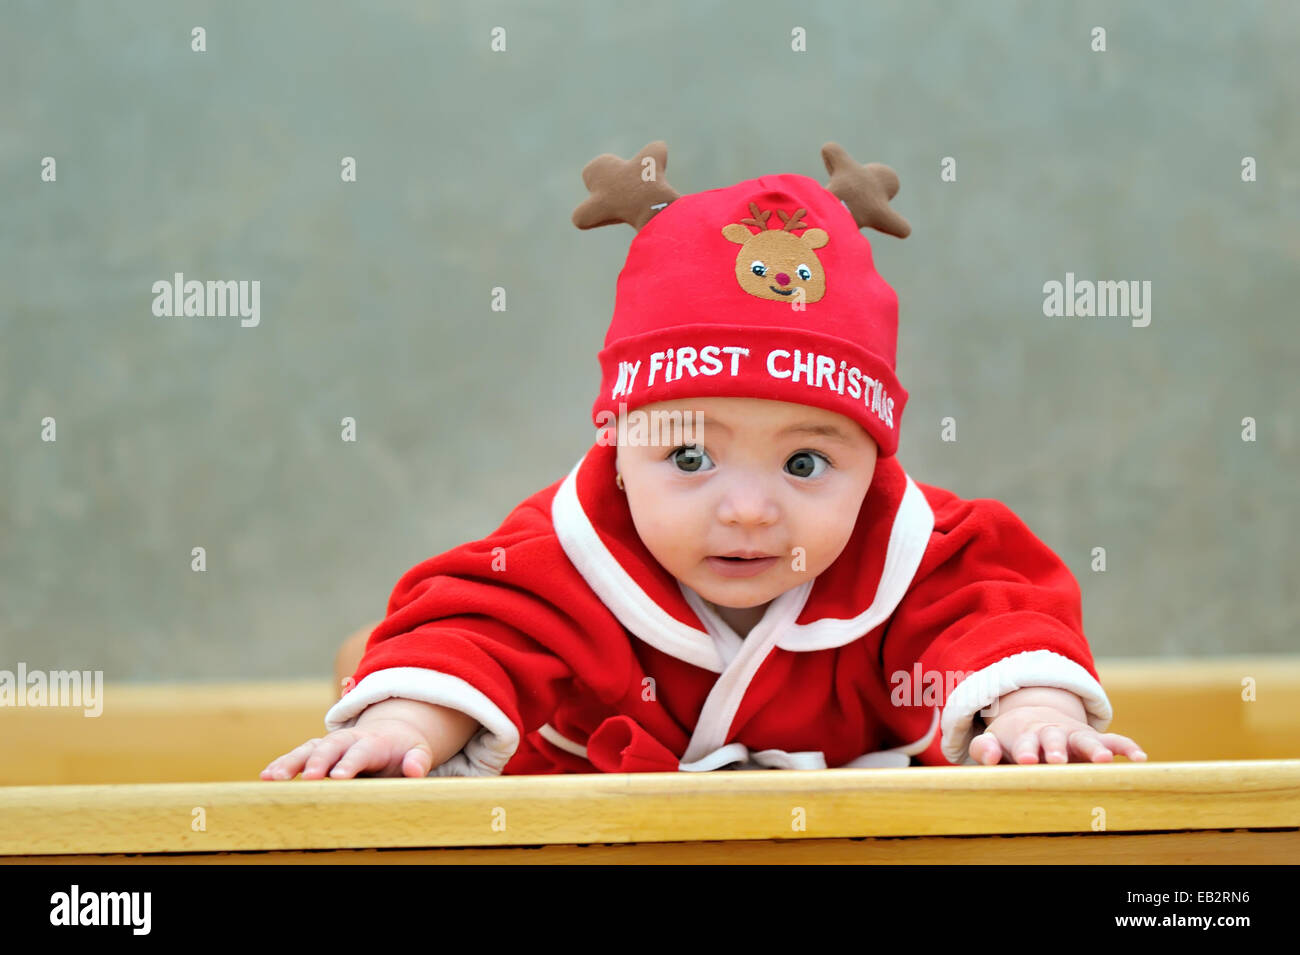 ff344ea98c261 Baby Reindeer Stock Photos   Baby Reindeer Stock Images - Alamy